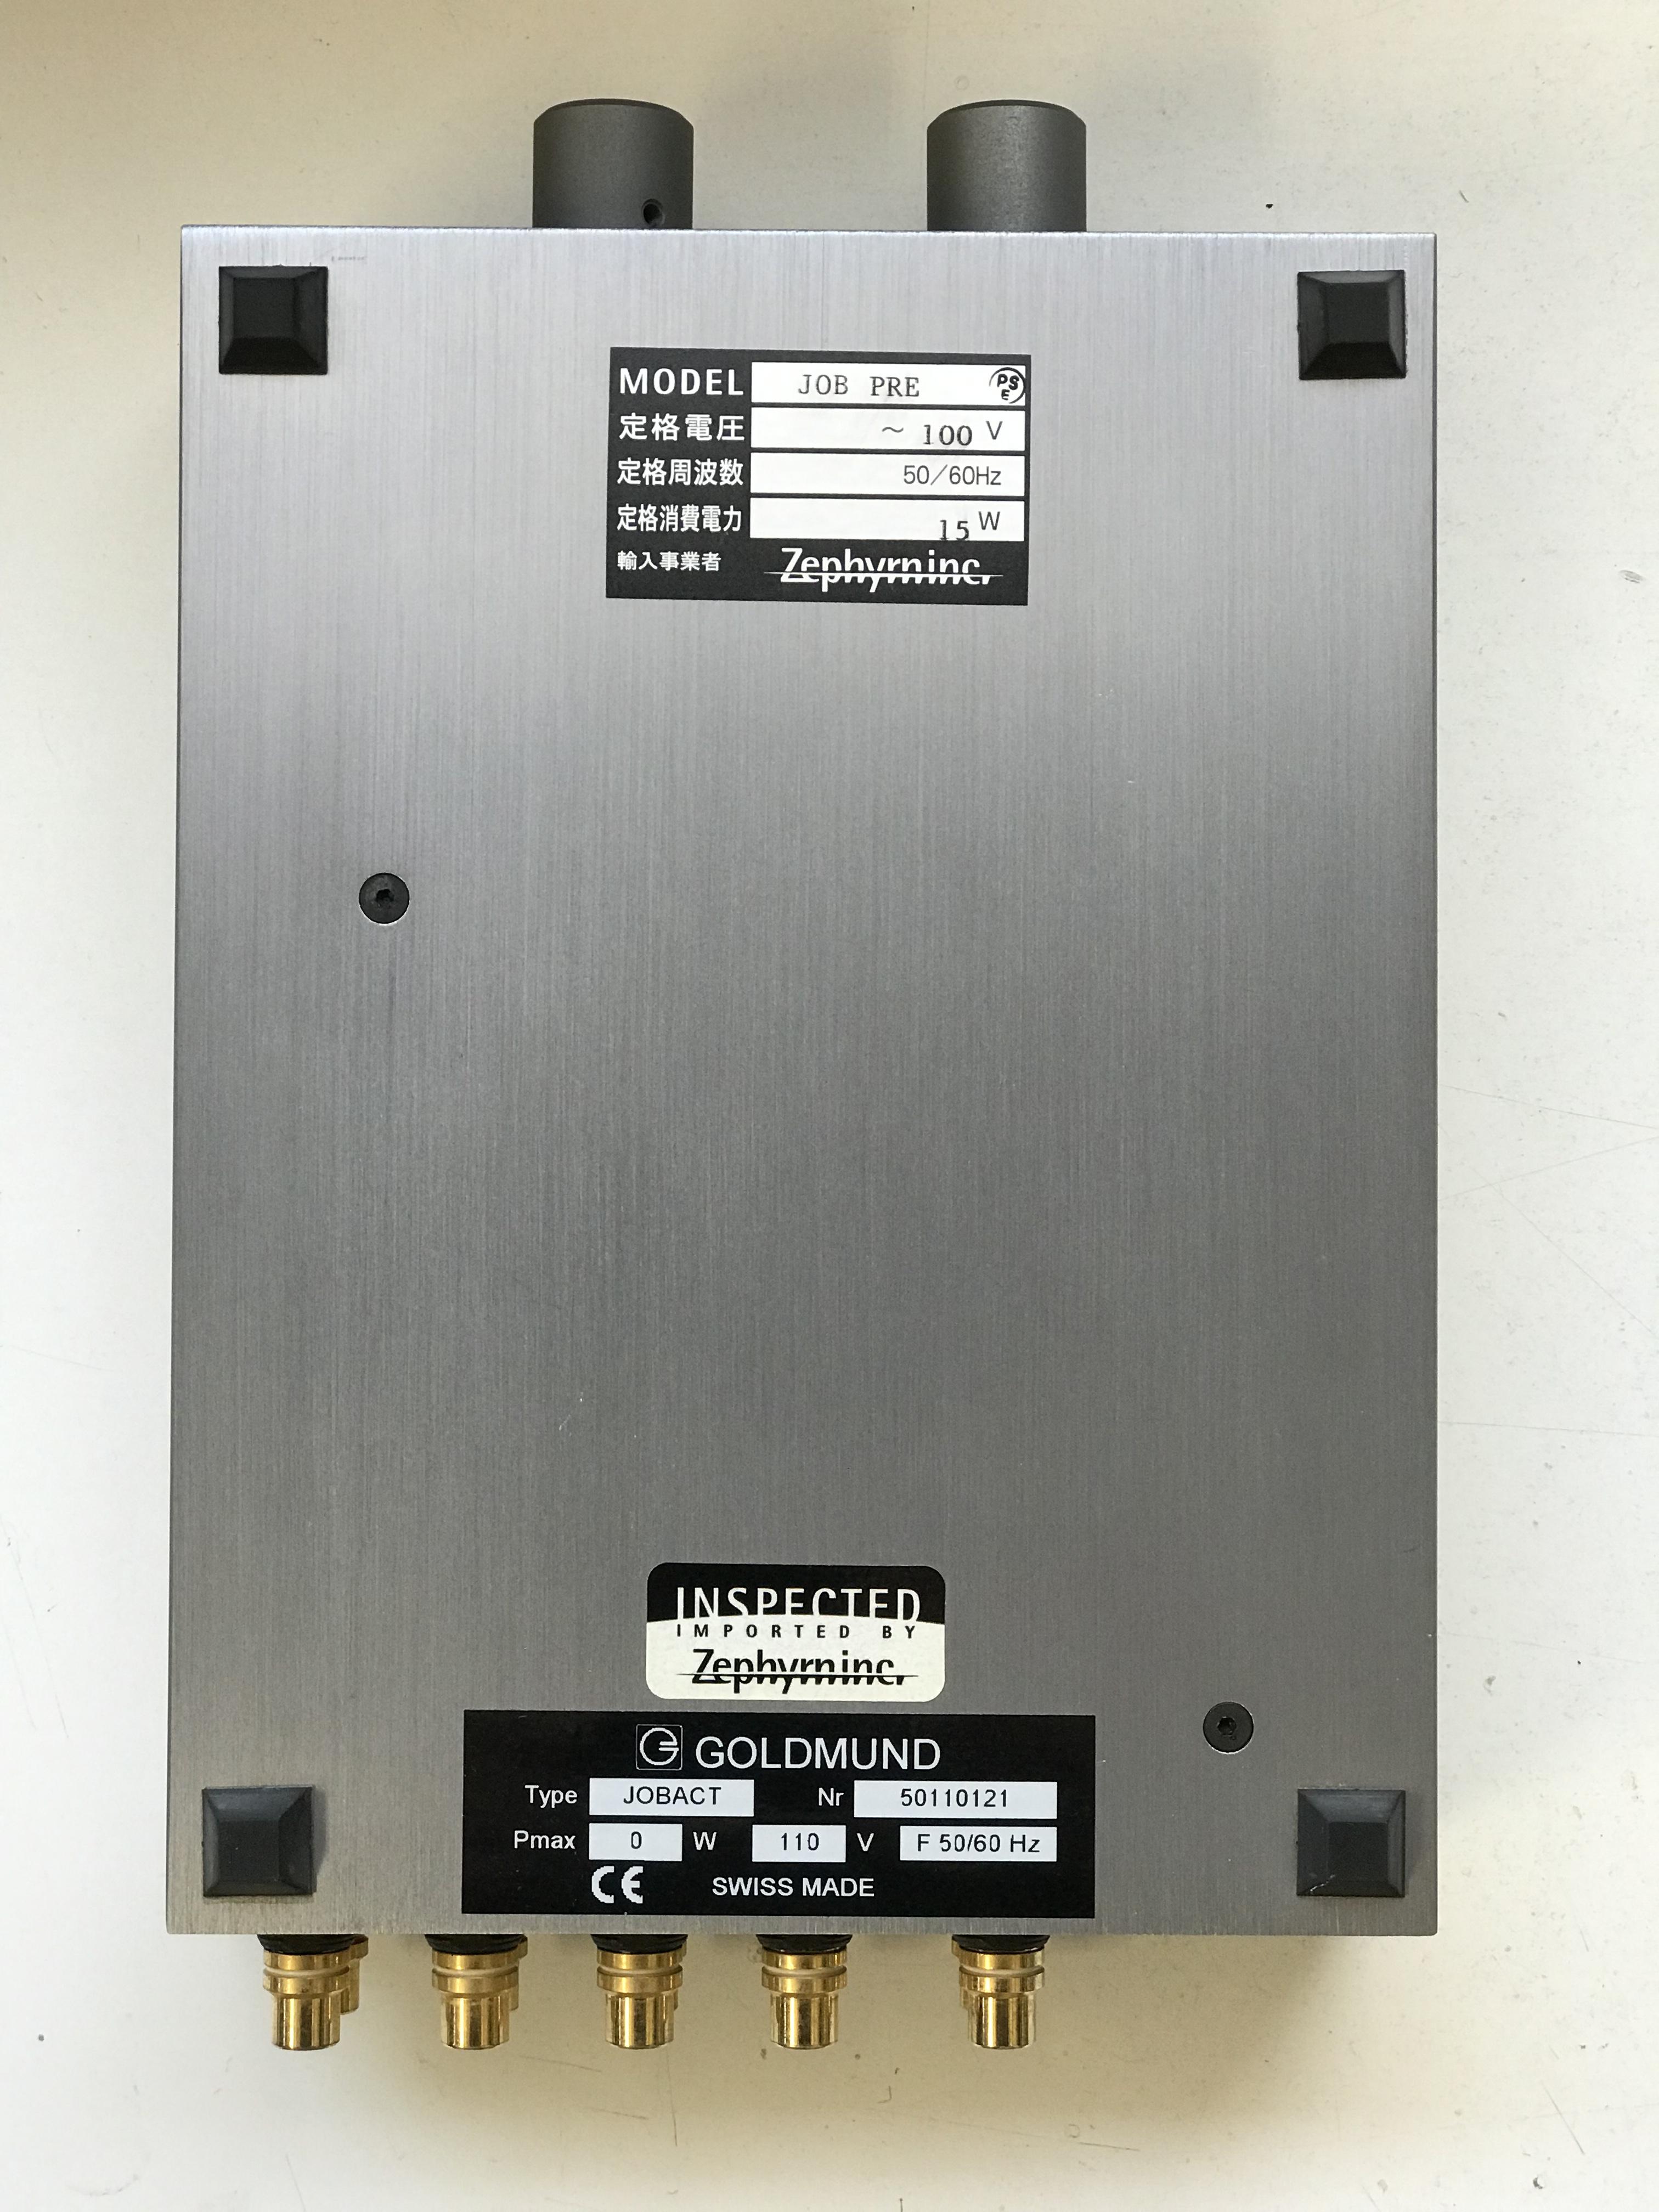 EC996197-584F-4ADE-AFDF-E4B62155A62B